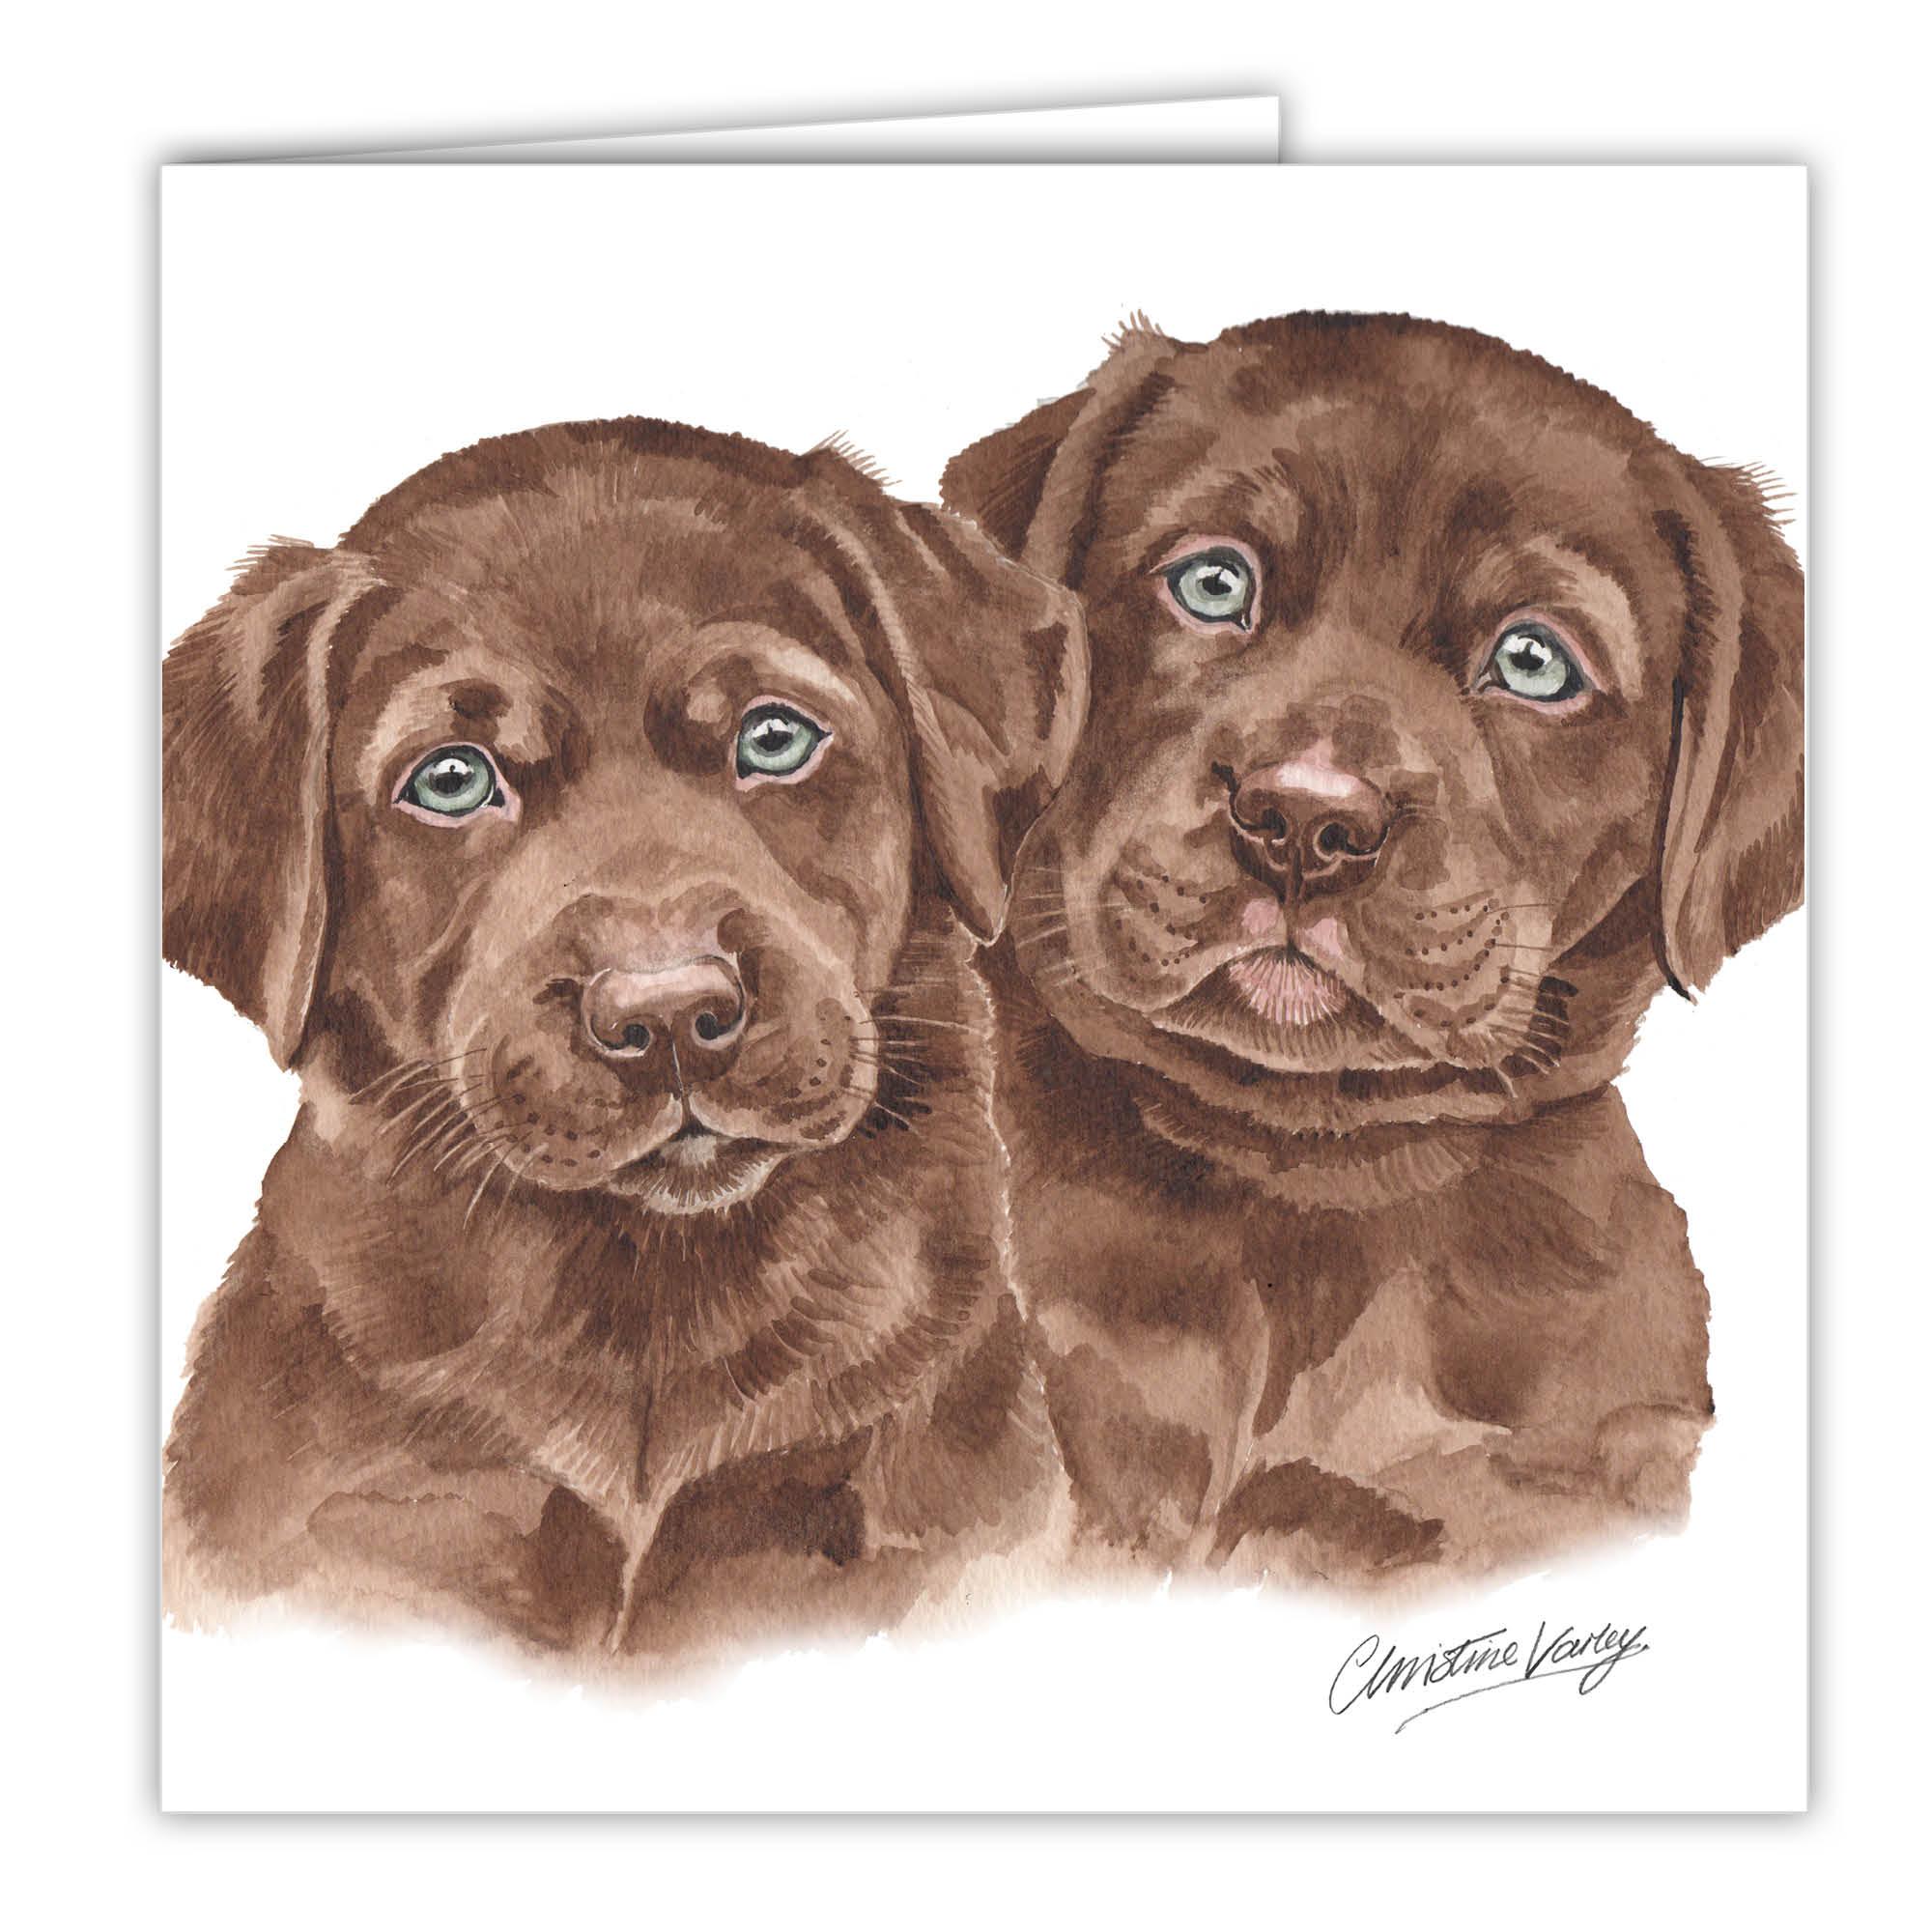 Chocolate Labrador Puppies Art Card Greetings Card Ac Pu13 Waggydogz